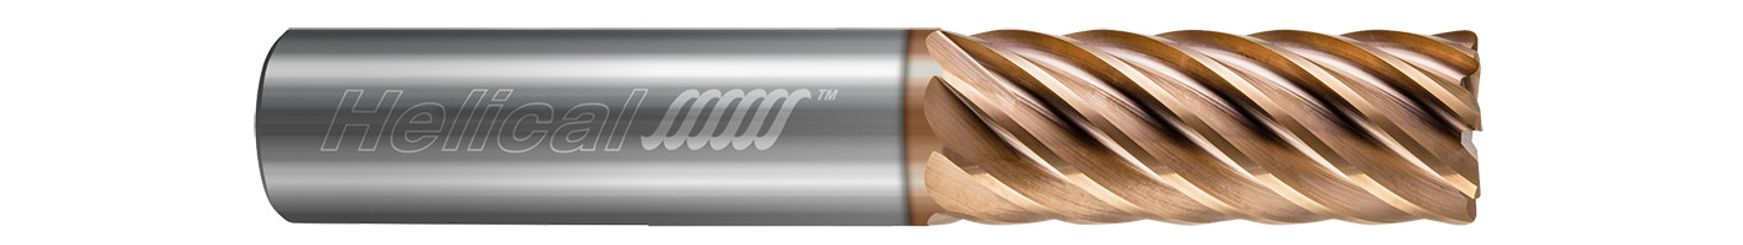 tool-details-59965